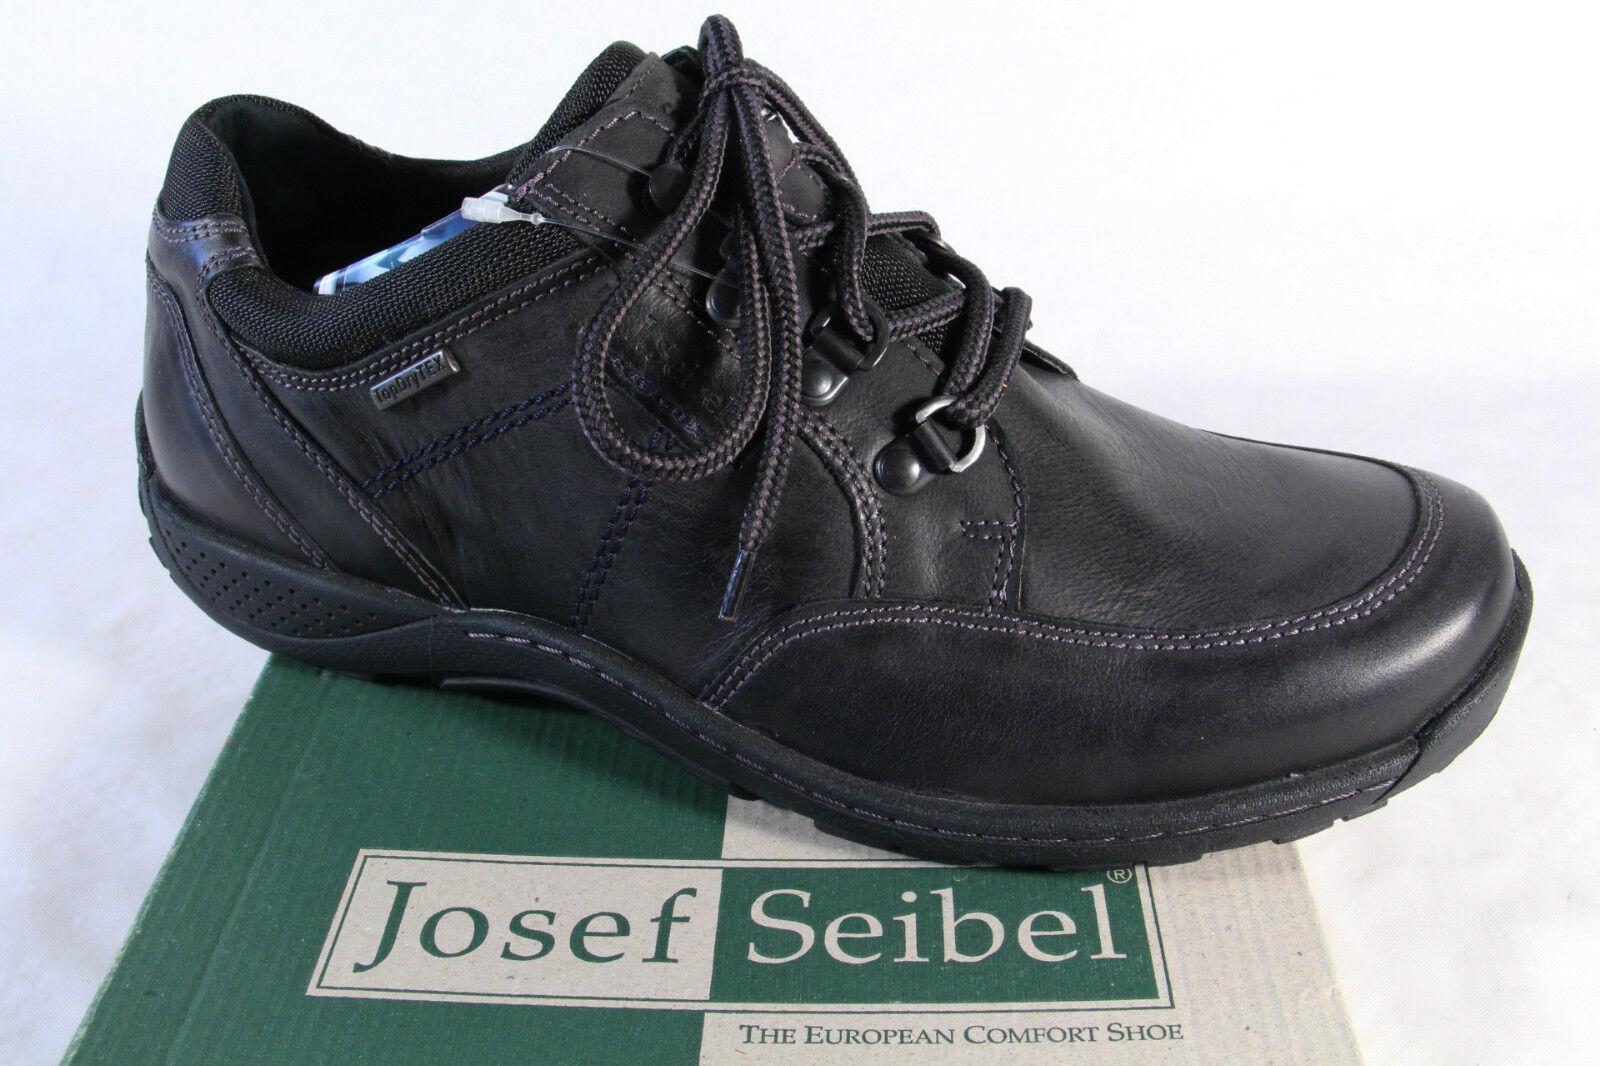 Seibel Herren Schnürschuh, Halbschuh Sneaker schwarz, Lederinnensohle,   NEU!